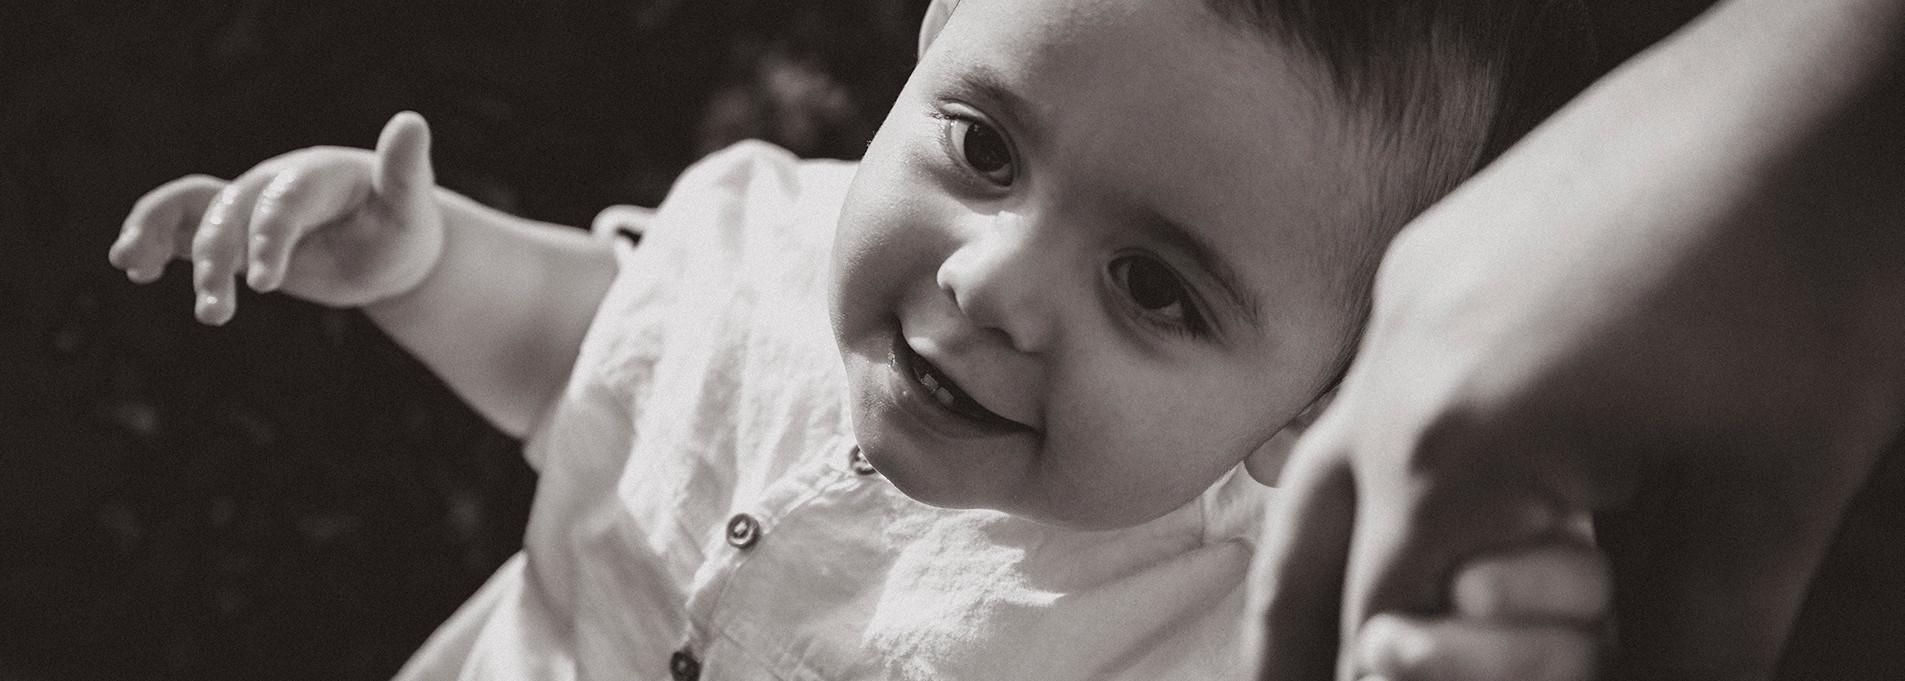 sesiones fotograficas infantil familiar merida badajoz extremadura estrella diaz photovisual 016